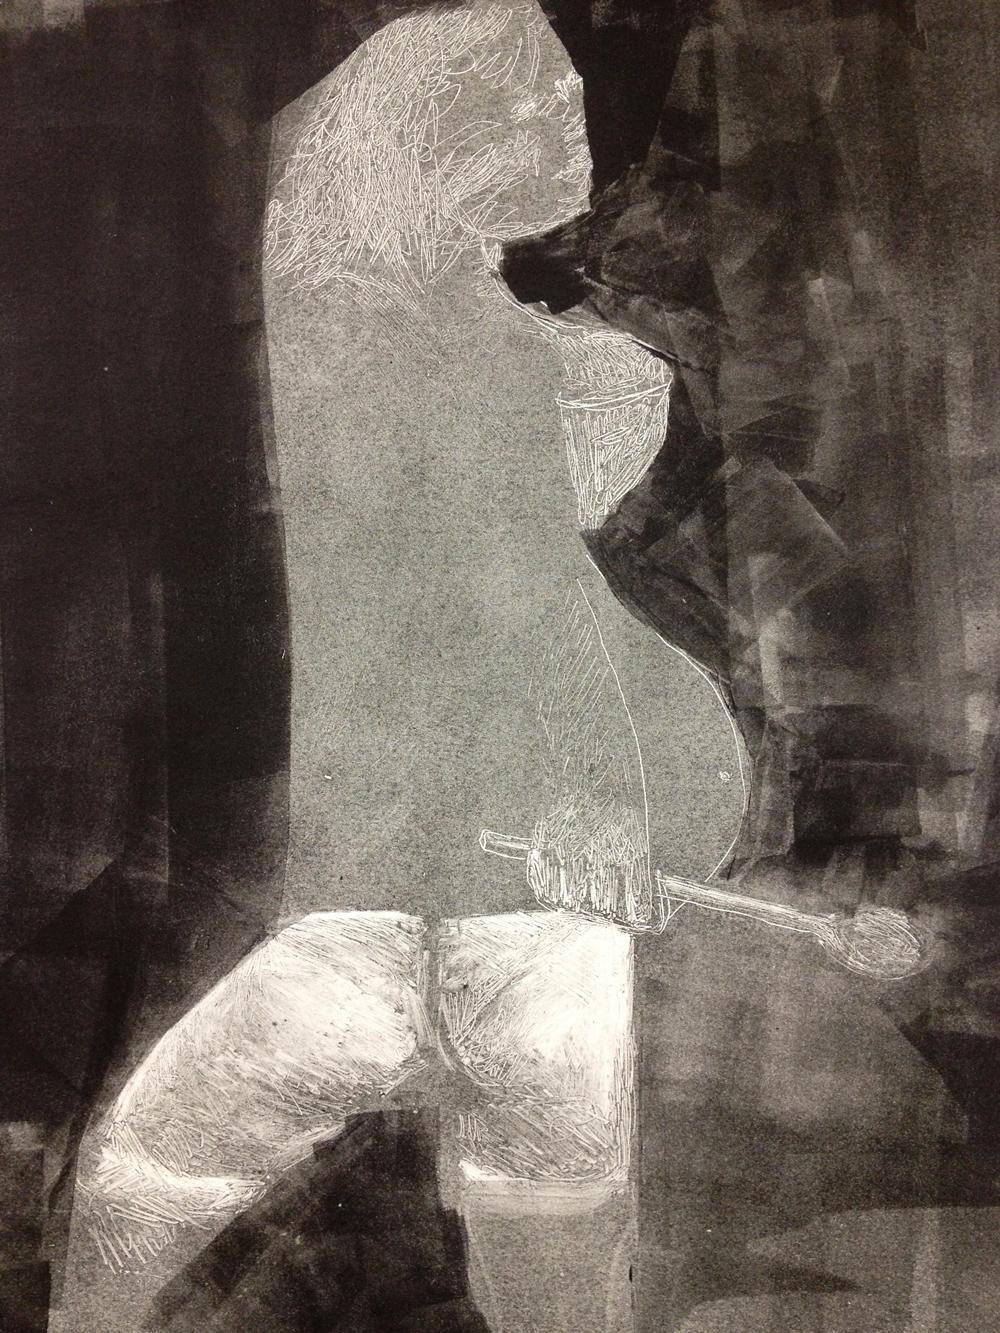 Untitled, 2013, monotype